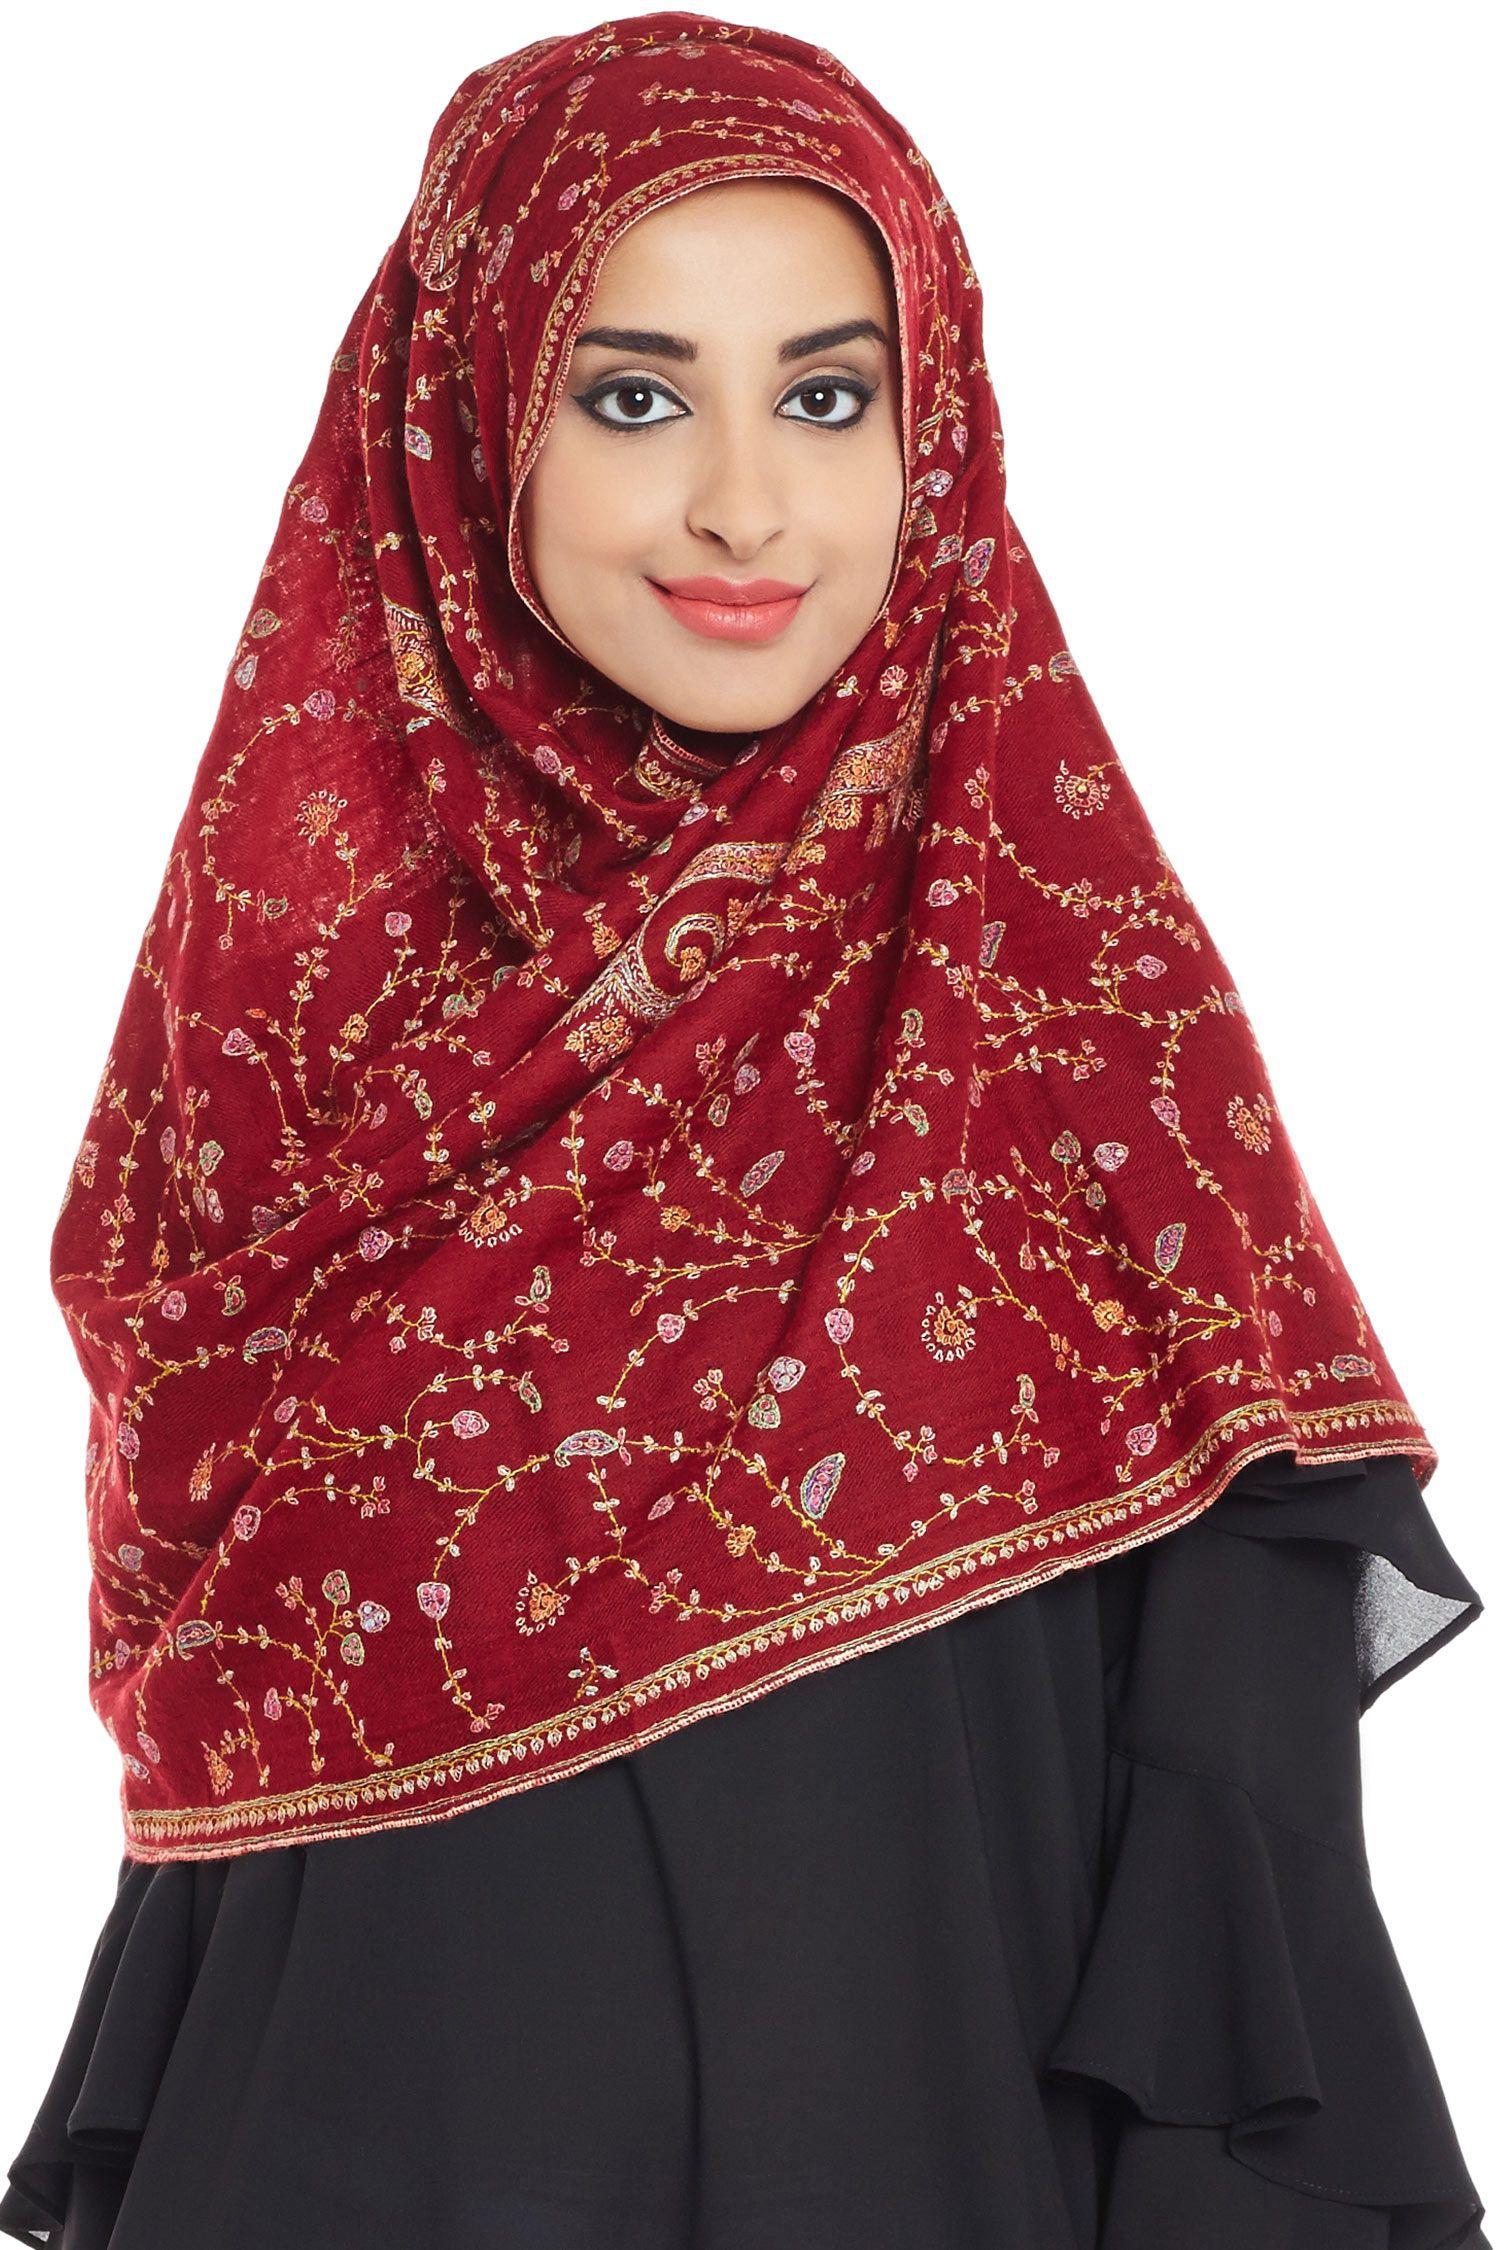 The Elongated Paisley Hijab